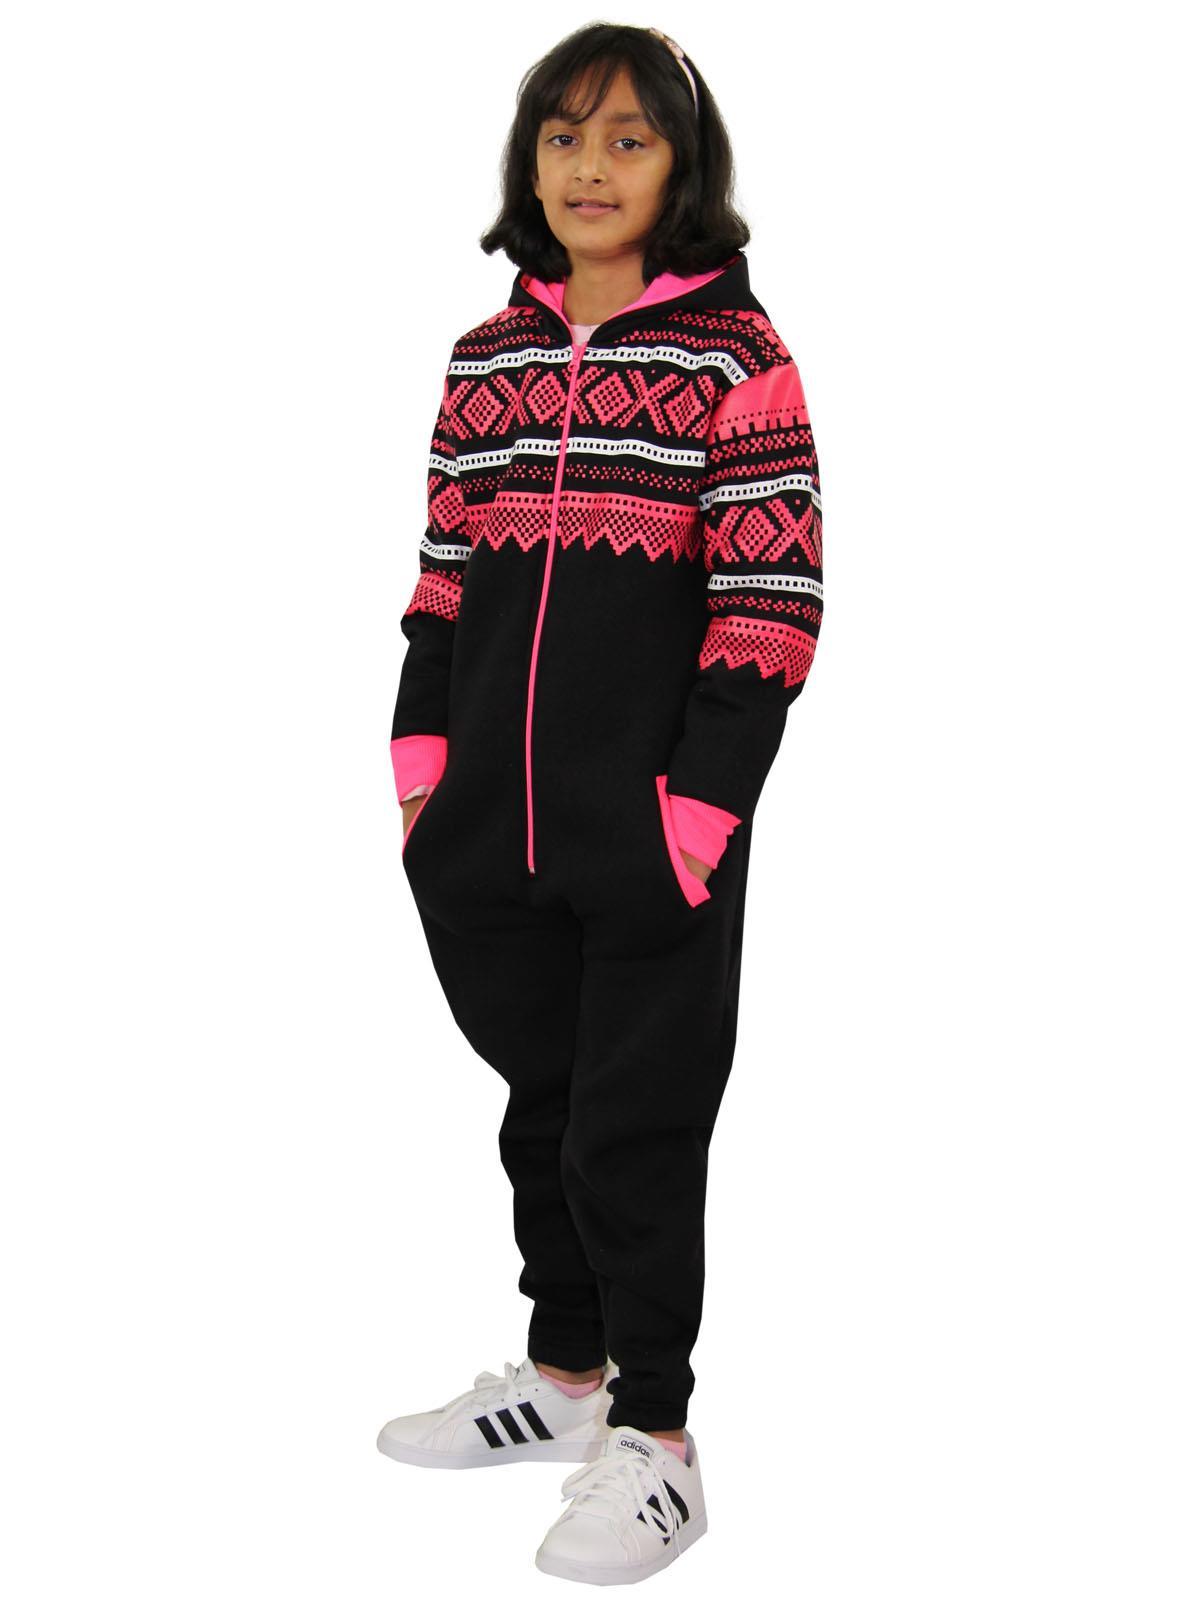 Kids Girls Boys Aztec Snowflake A2Z Onesie One Piece Jumpsuit Playsuit 7-13 Year